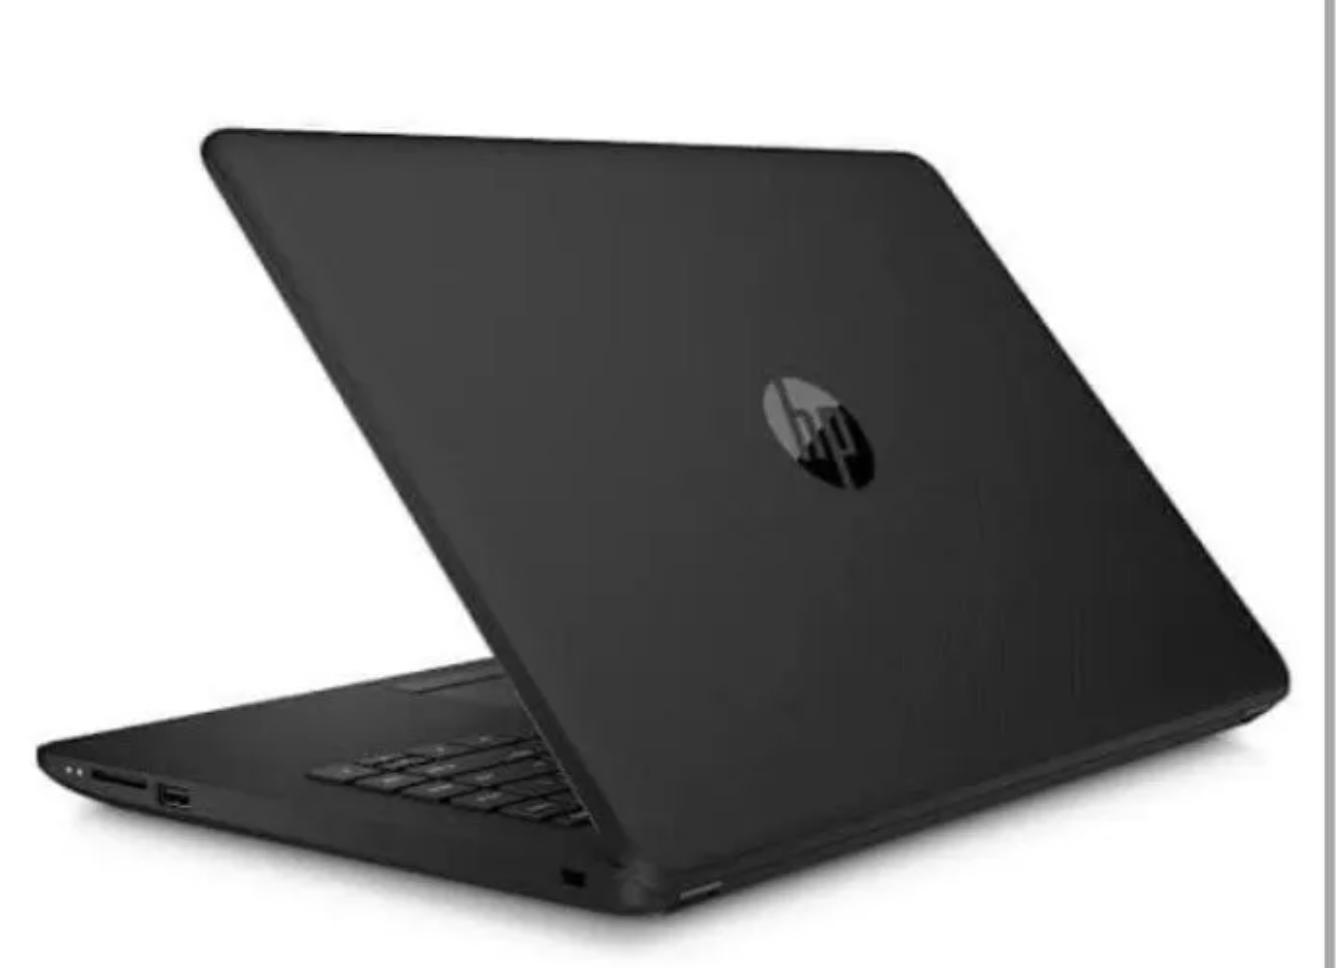 Computadora de color oscuro